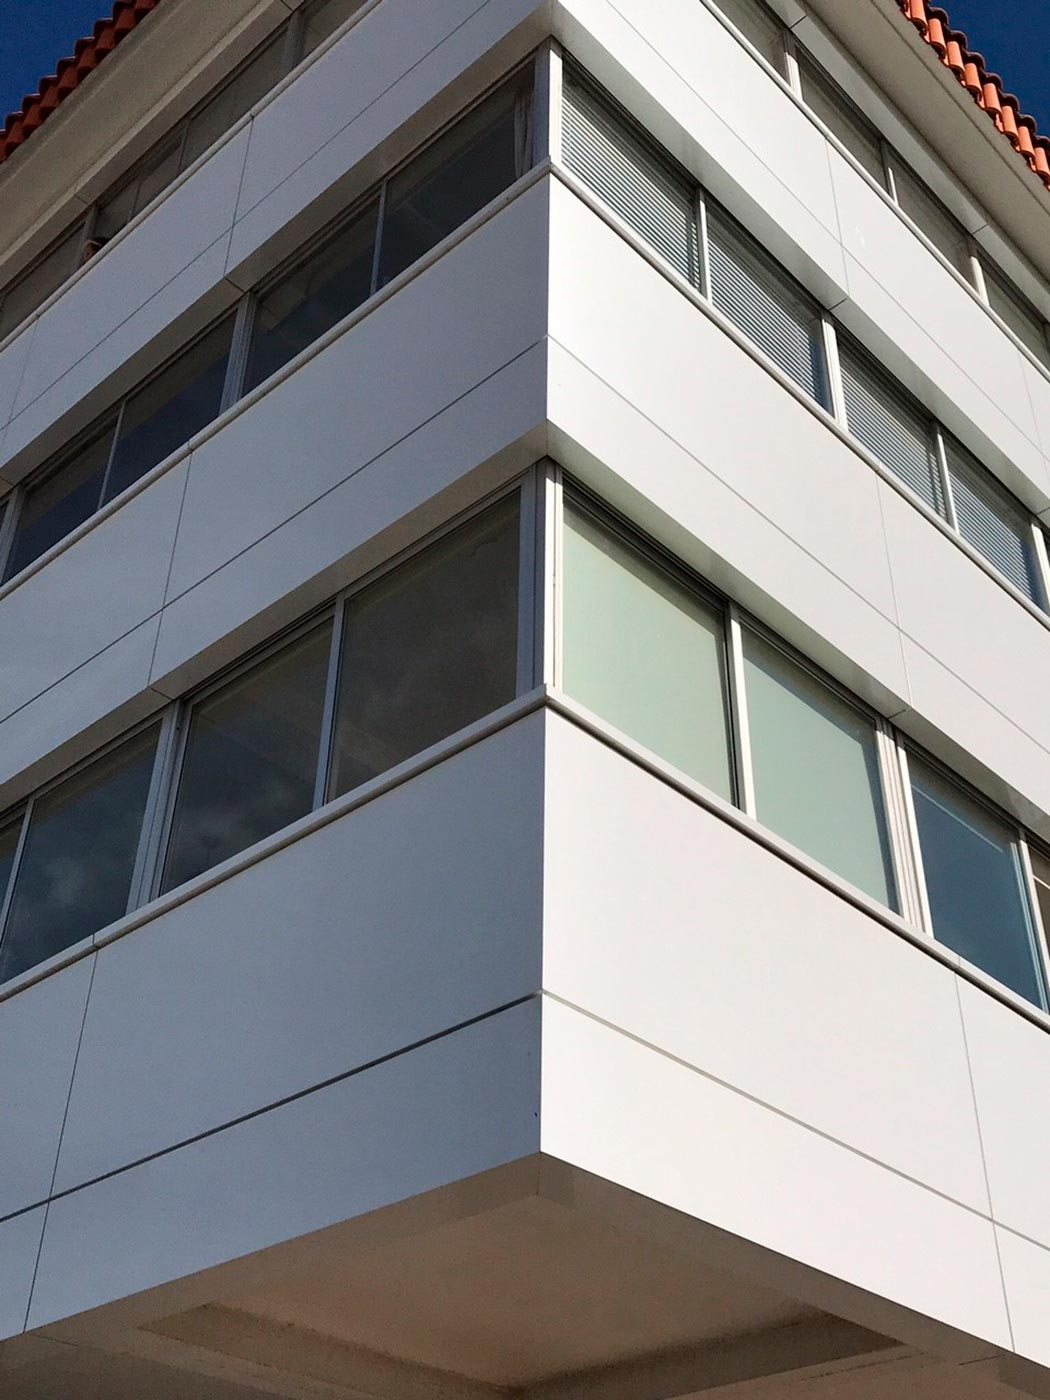 Reahabilitacin-viviendas.-Baiona-Pontevedra.-larson-FR-Holo-white---Silver-6_1592393444.jpg